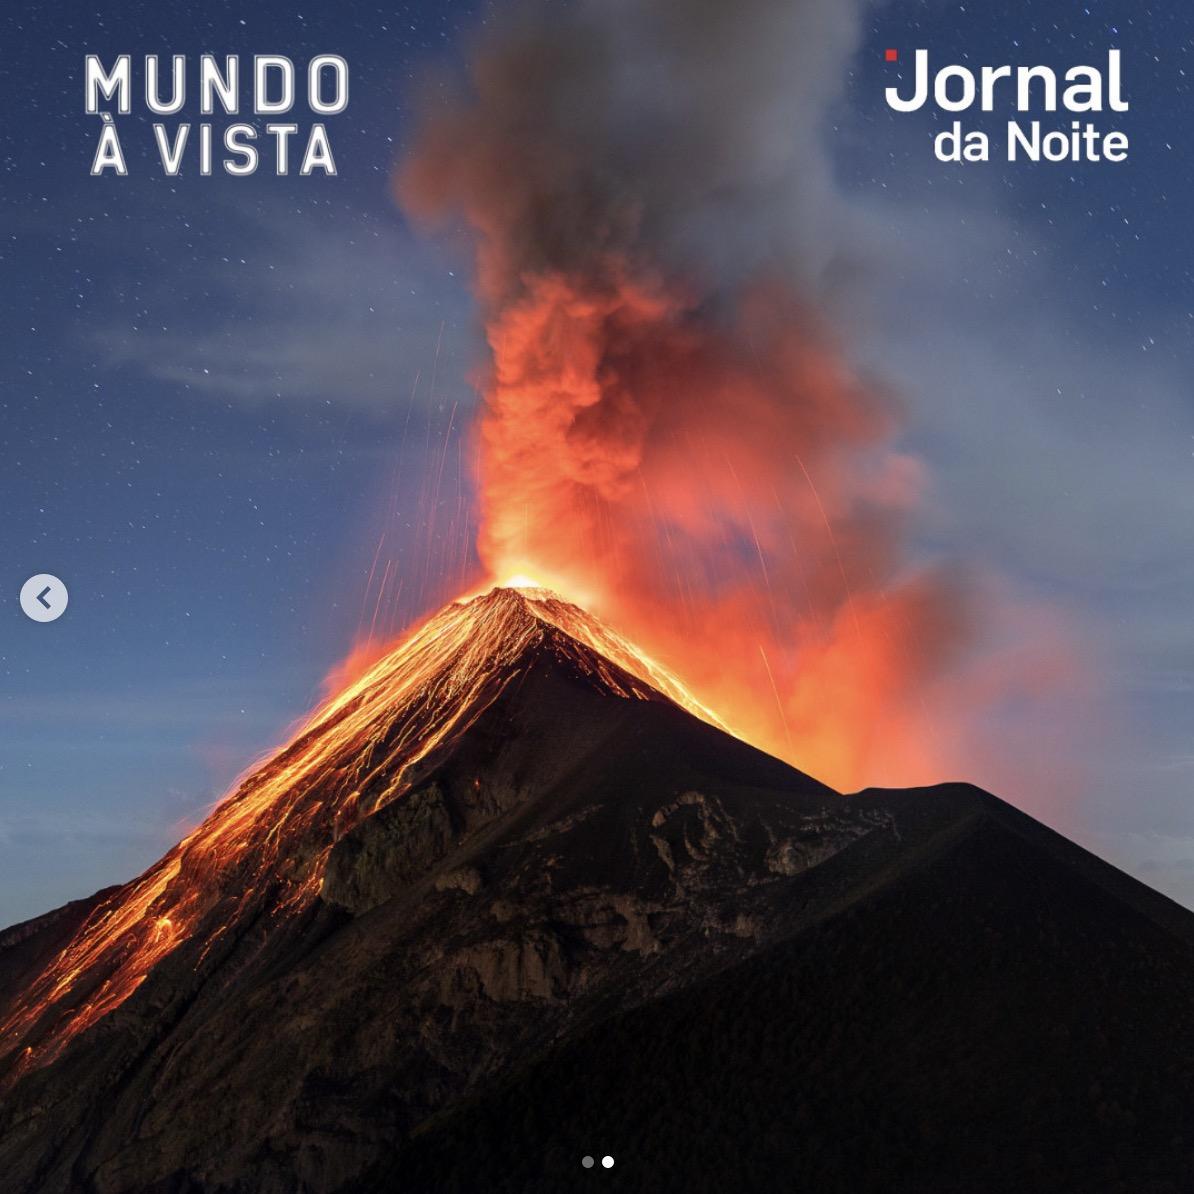 Mundo-a-vista-joel-santos-jornal-da-noite-sic-noticias-guatemala-vulcao-fuego.jpg